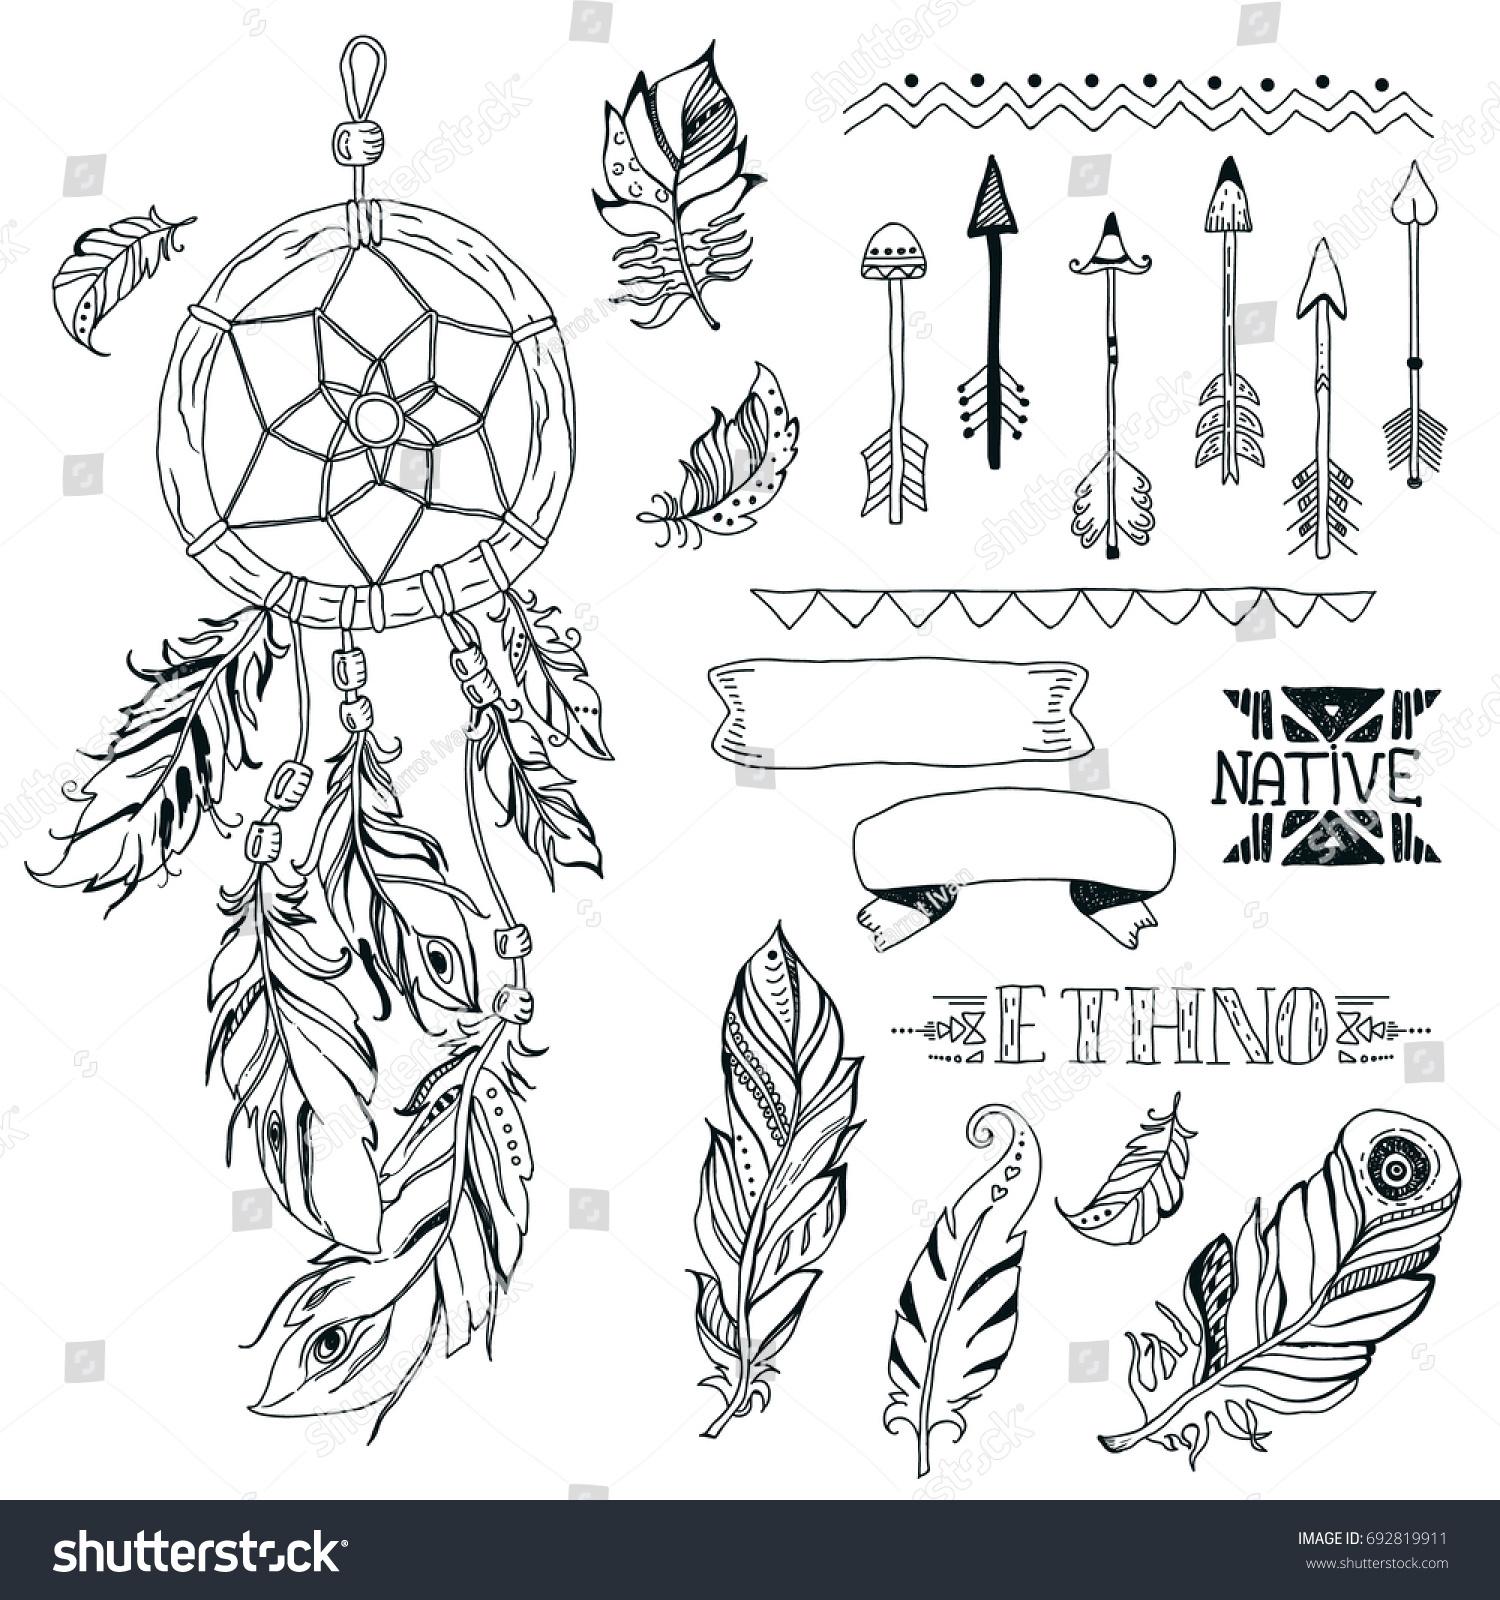 Tribal design elements aztec symbols arrows stock illustration tribal design elements aztec symbols arrows dream catcherribbon native american biocorpaavc Gallery